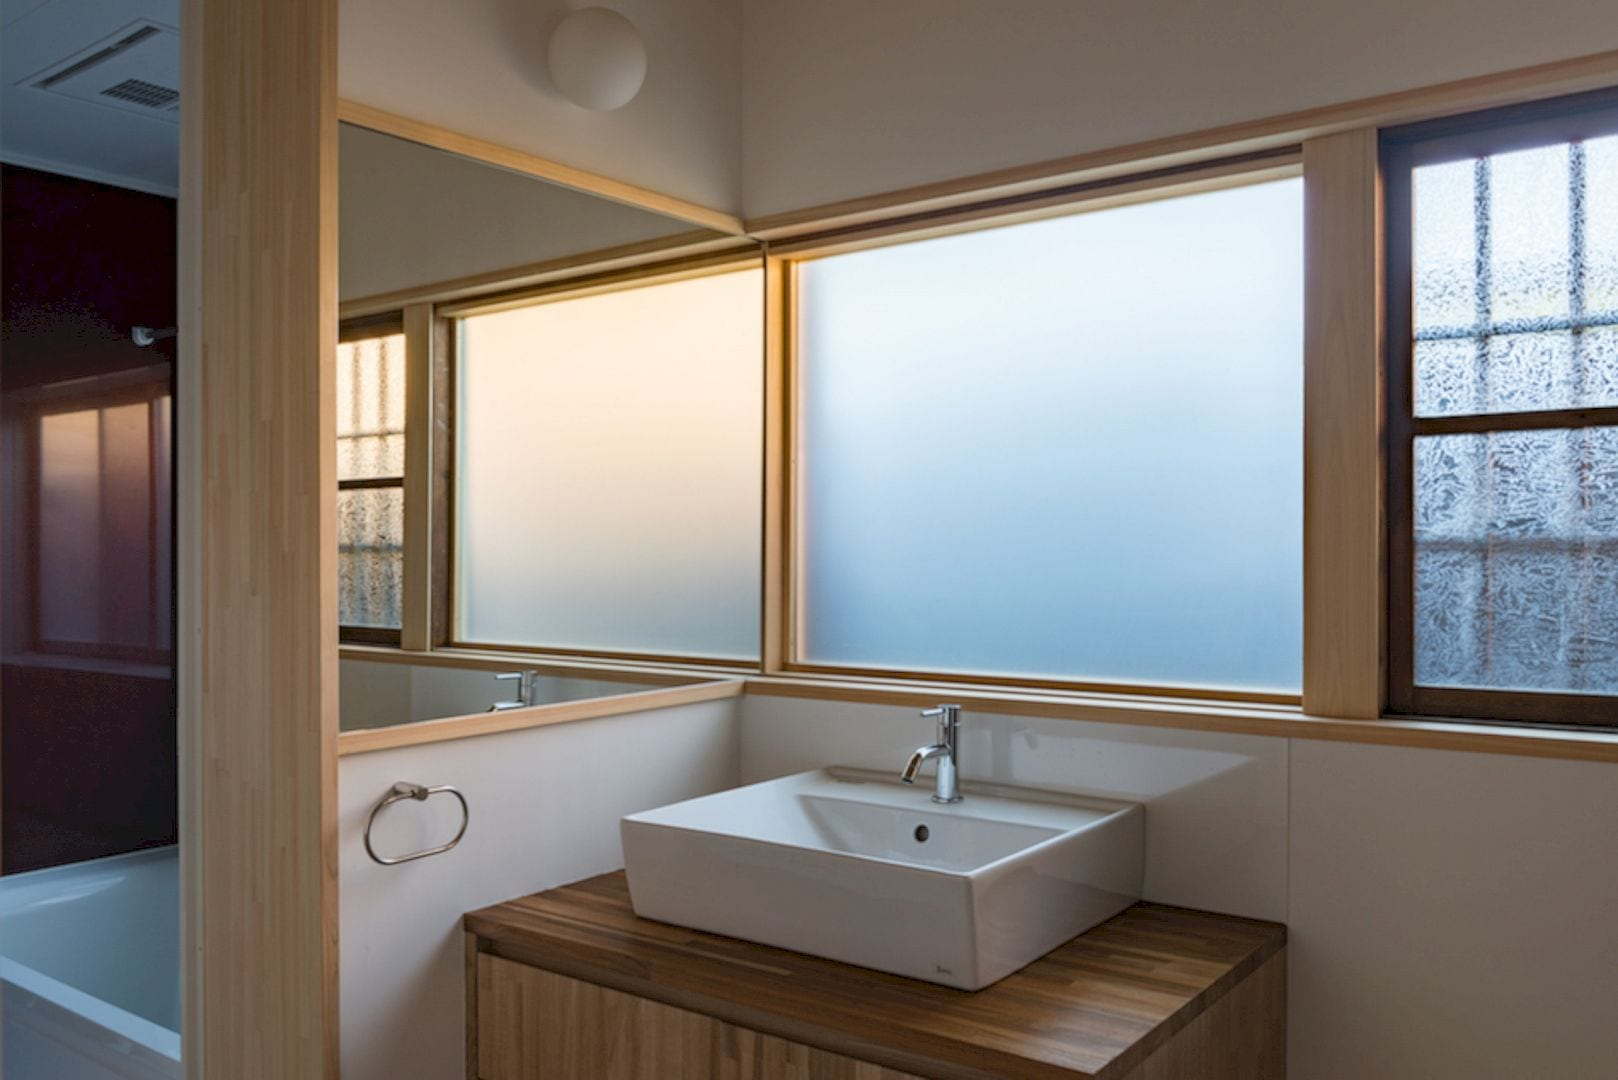 House In Shishigatani By Kazuya Morita Architecture Studio 3